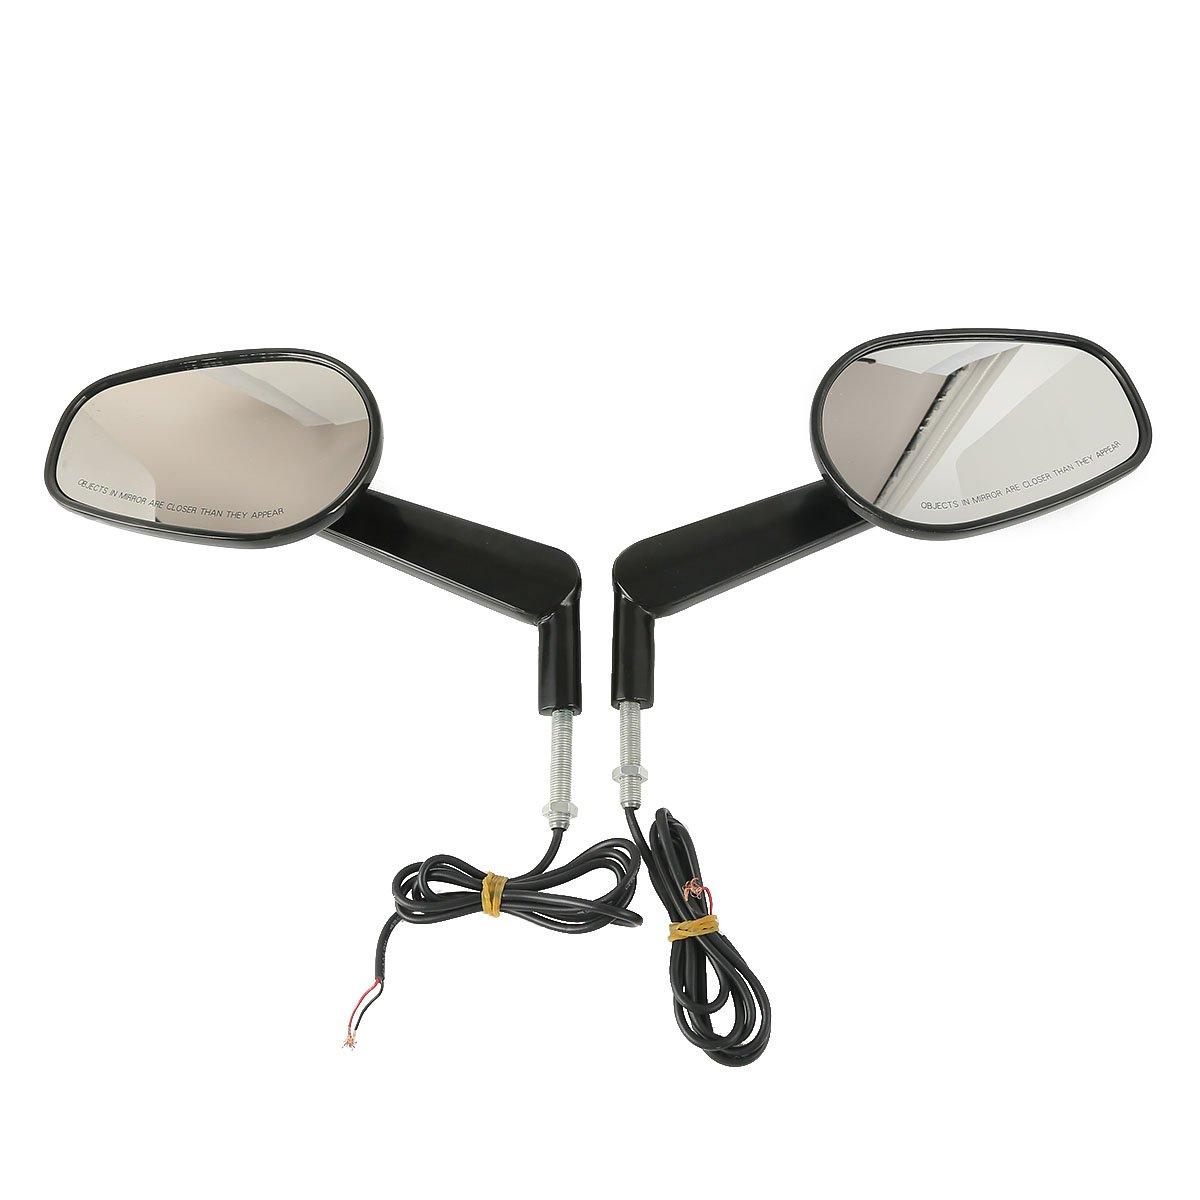 XMT-MOTO Muscle Rear View Mirrors LED Turn Signals For Harley Davidson VROD V-Rod VRSCF